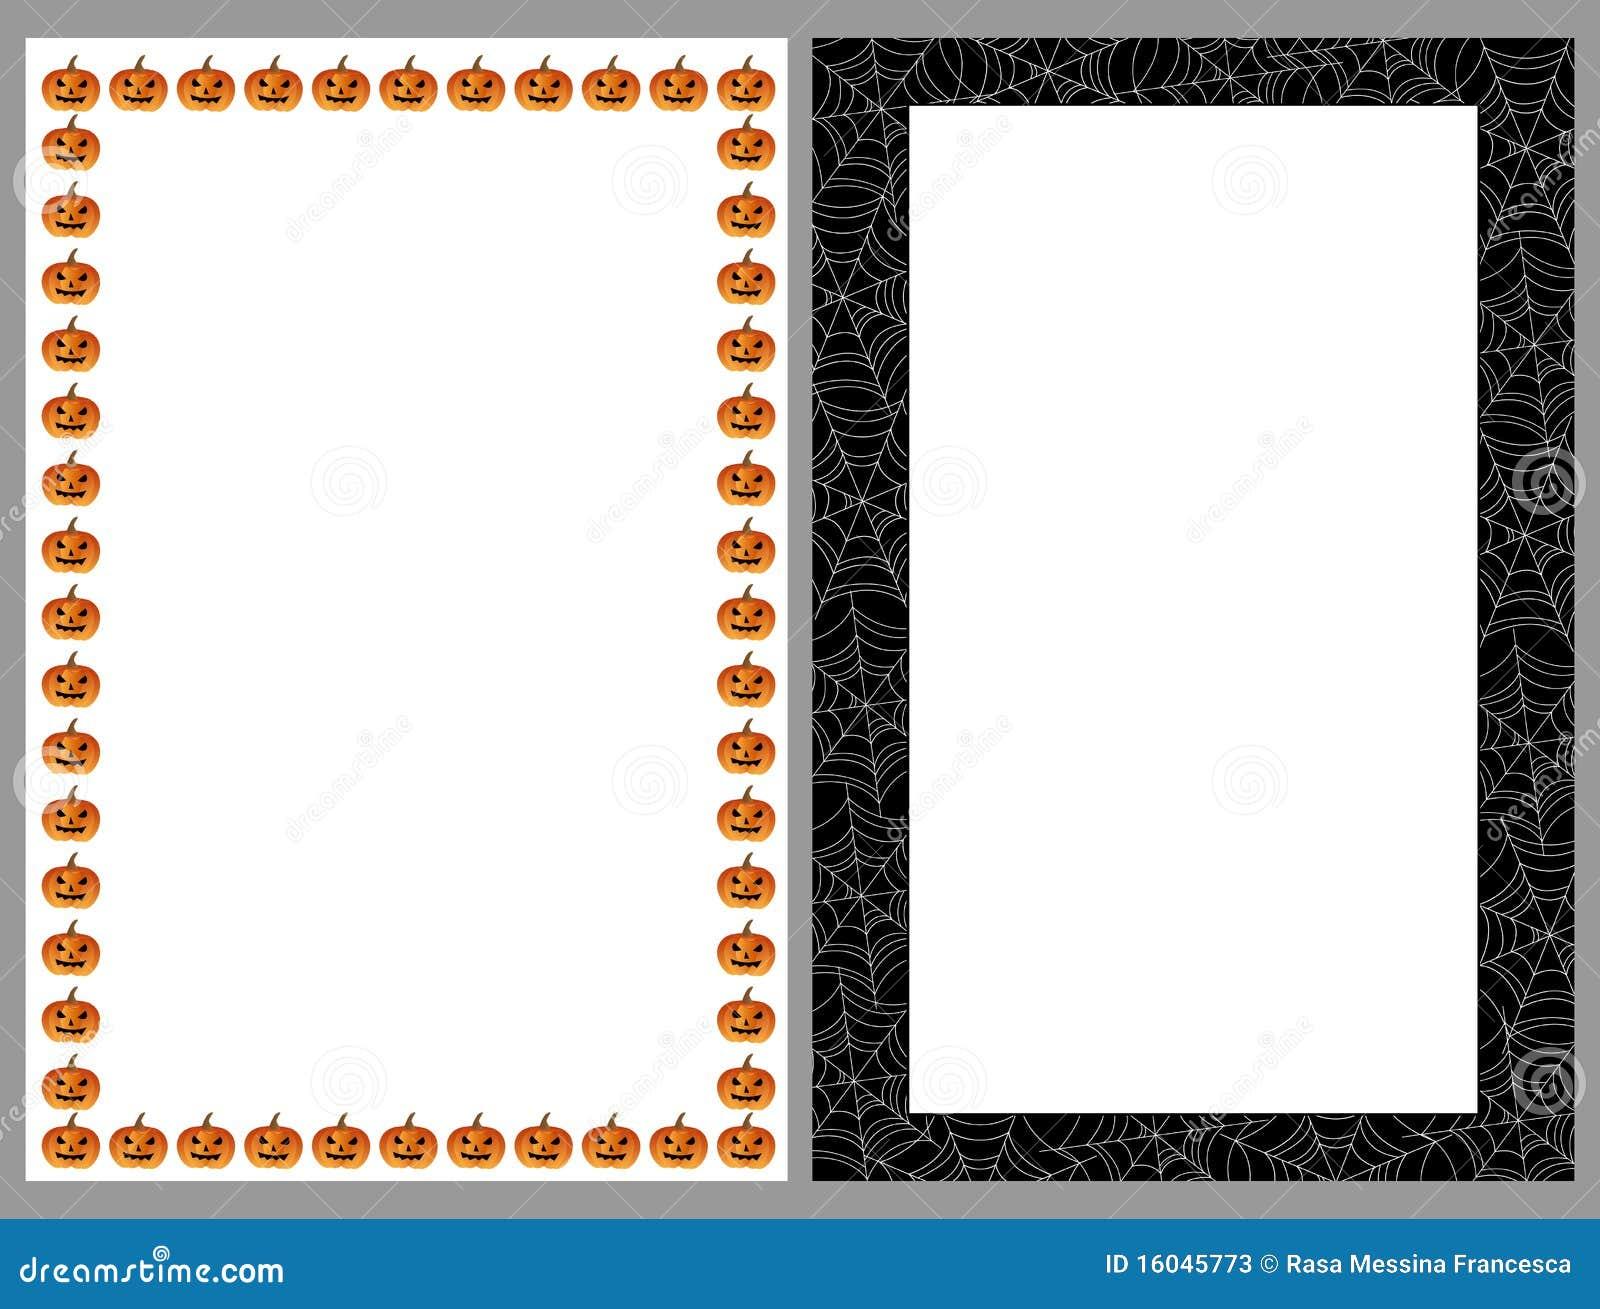 Halloween borders frames